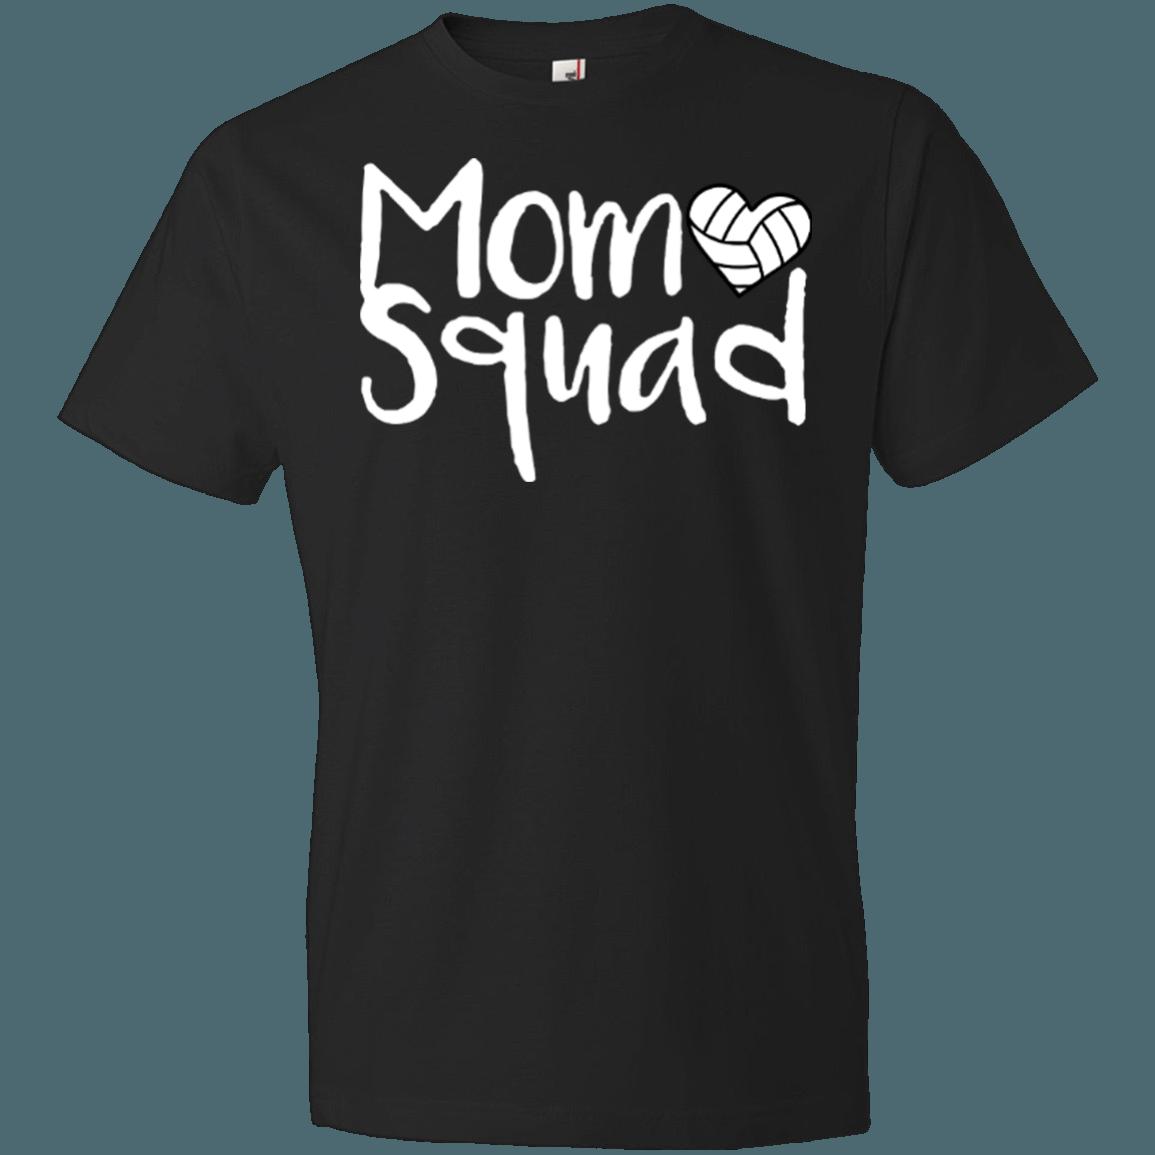 Unisex Shirt Mom Squad Volleyball Volleyball Shirts Volleyball Mom Shirts Sports Mom